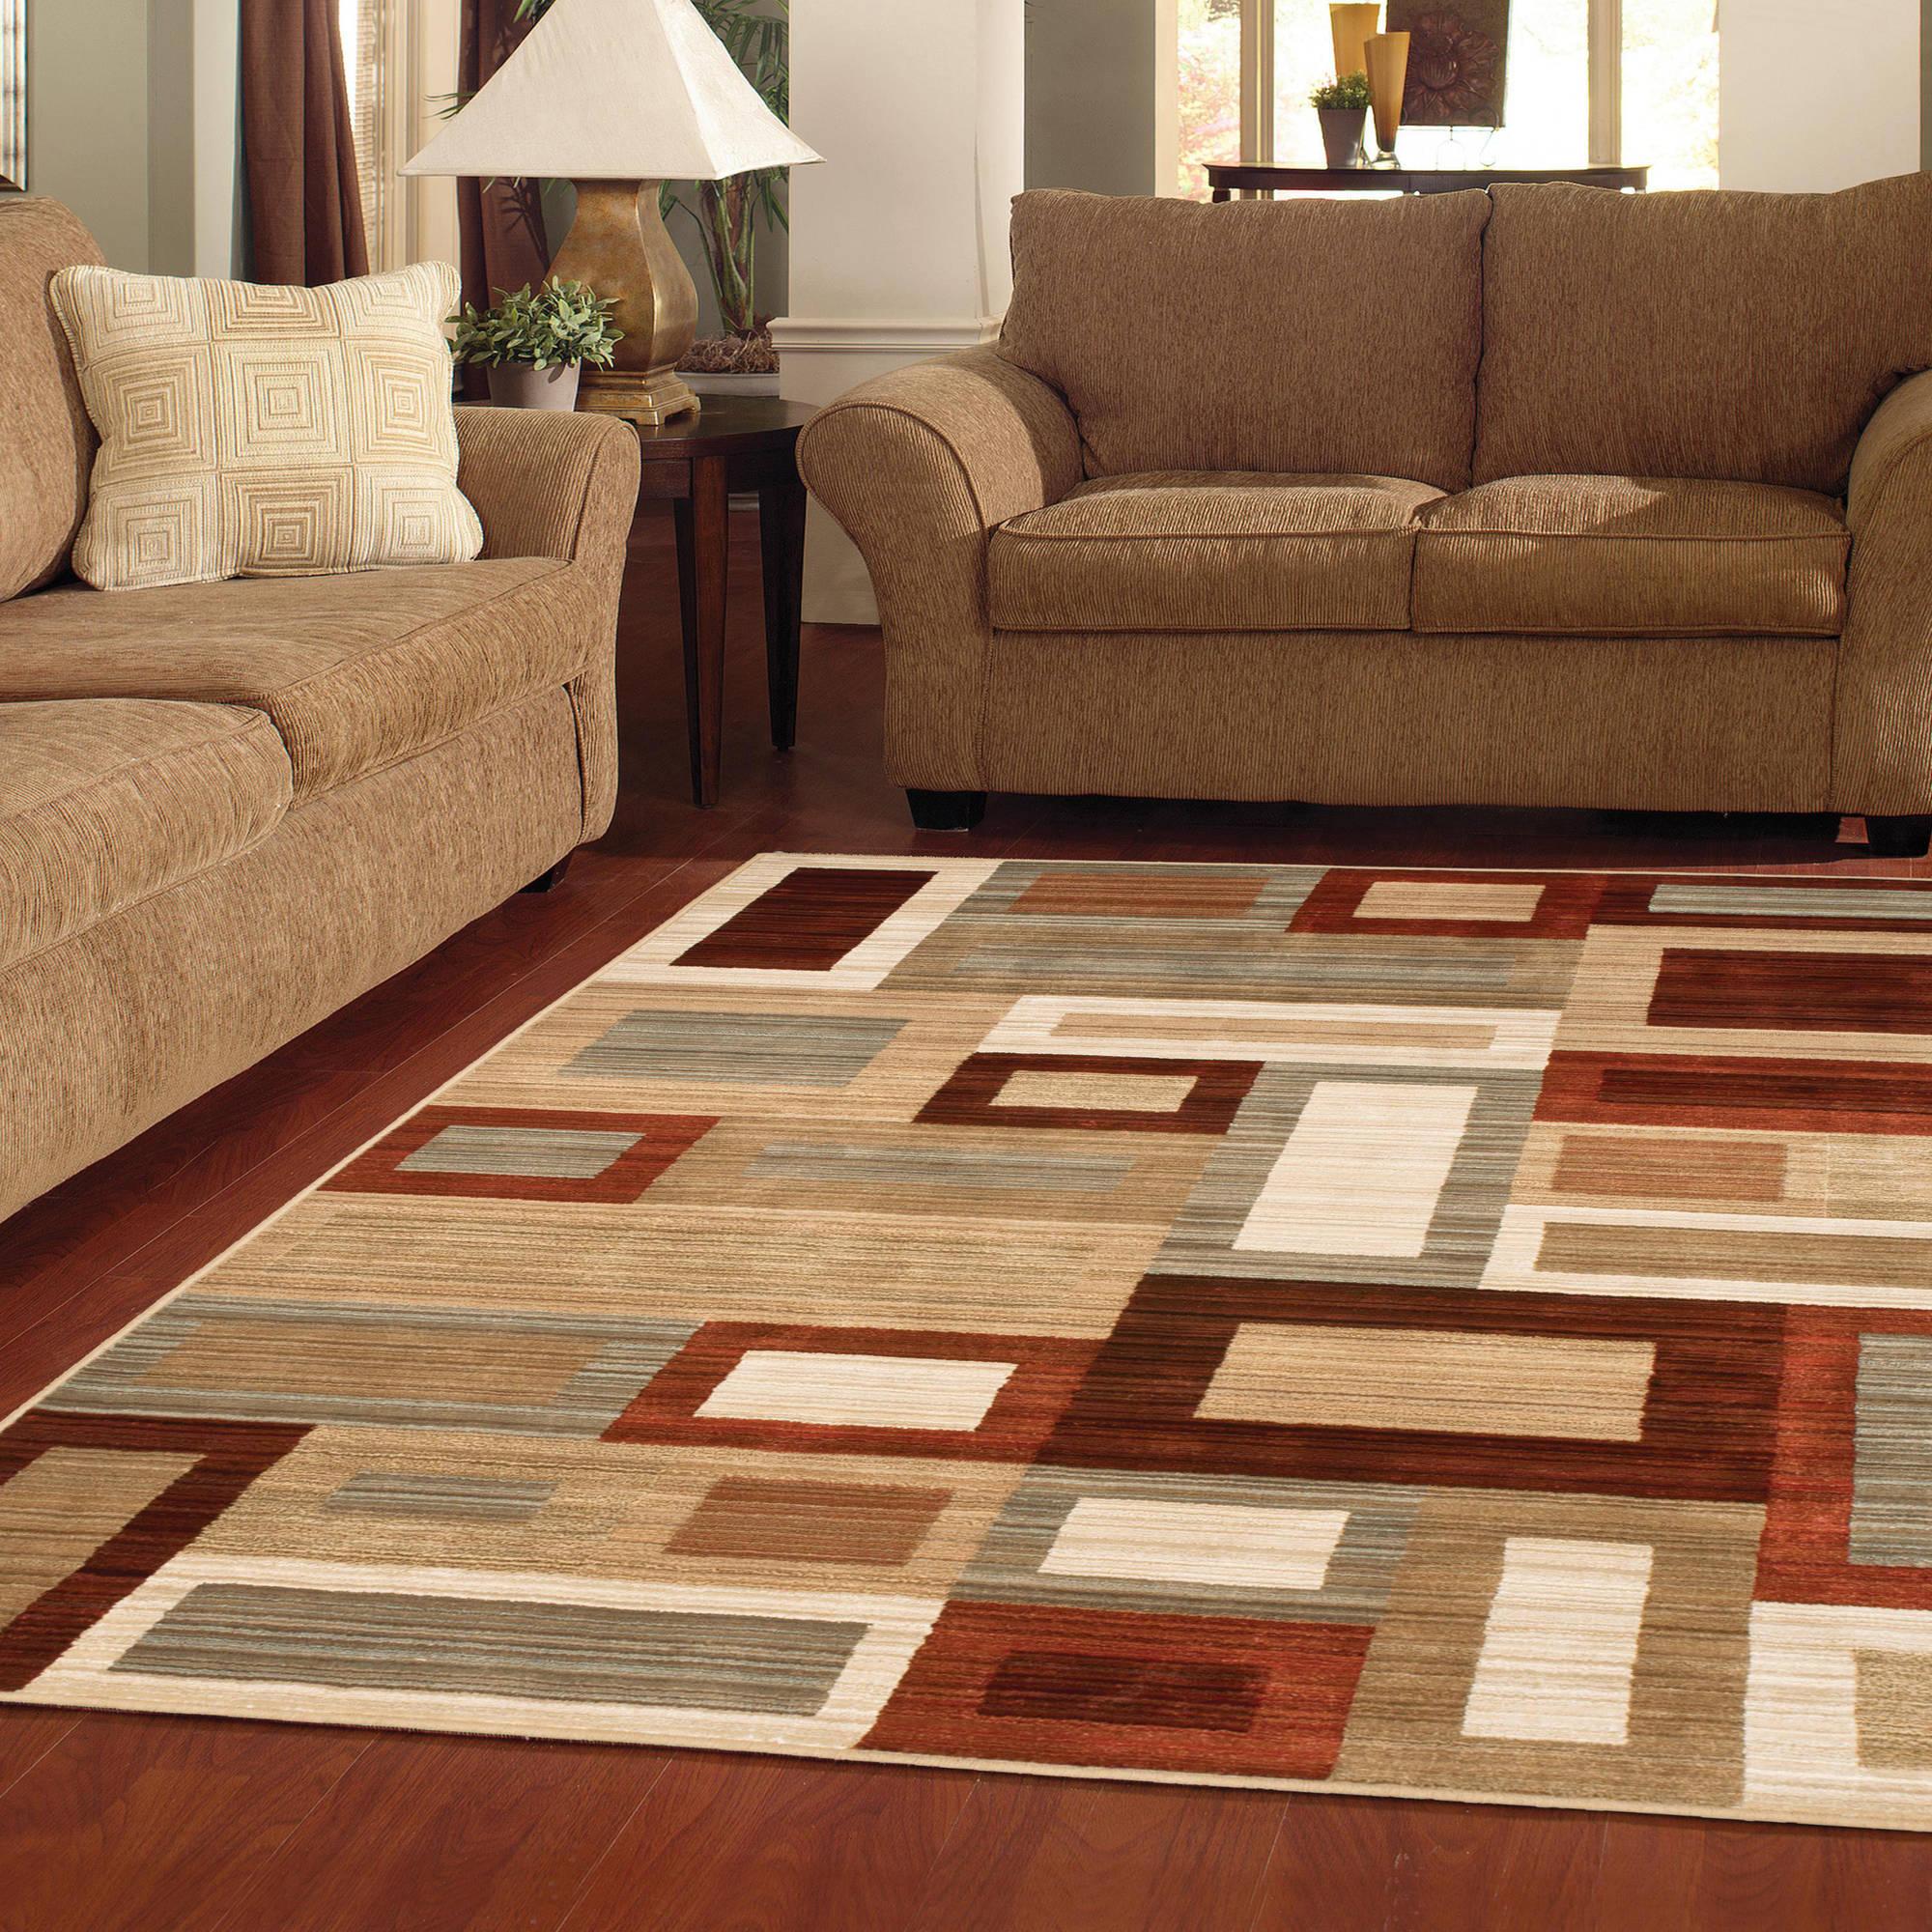 area carpet better homes and gardens franklin squares area rug or runner - walmart.com KWGXVVS